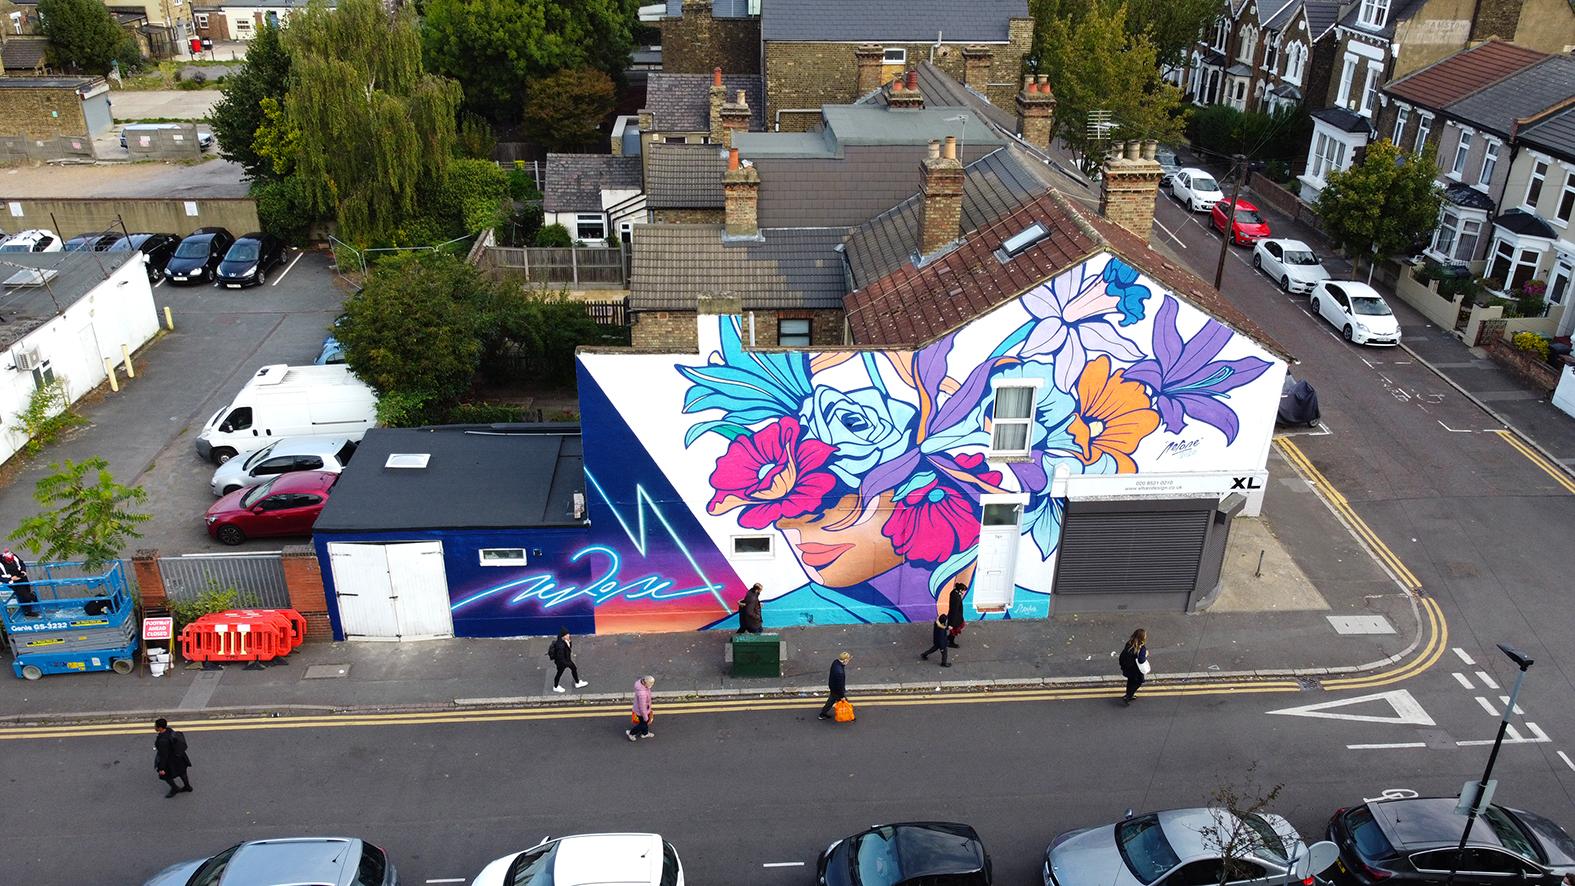 NERONE-mural-london-street-art-6